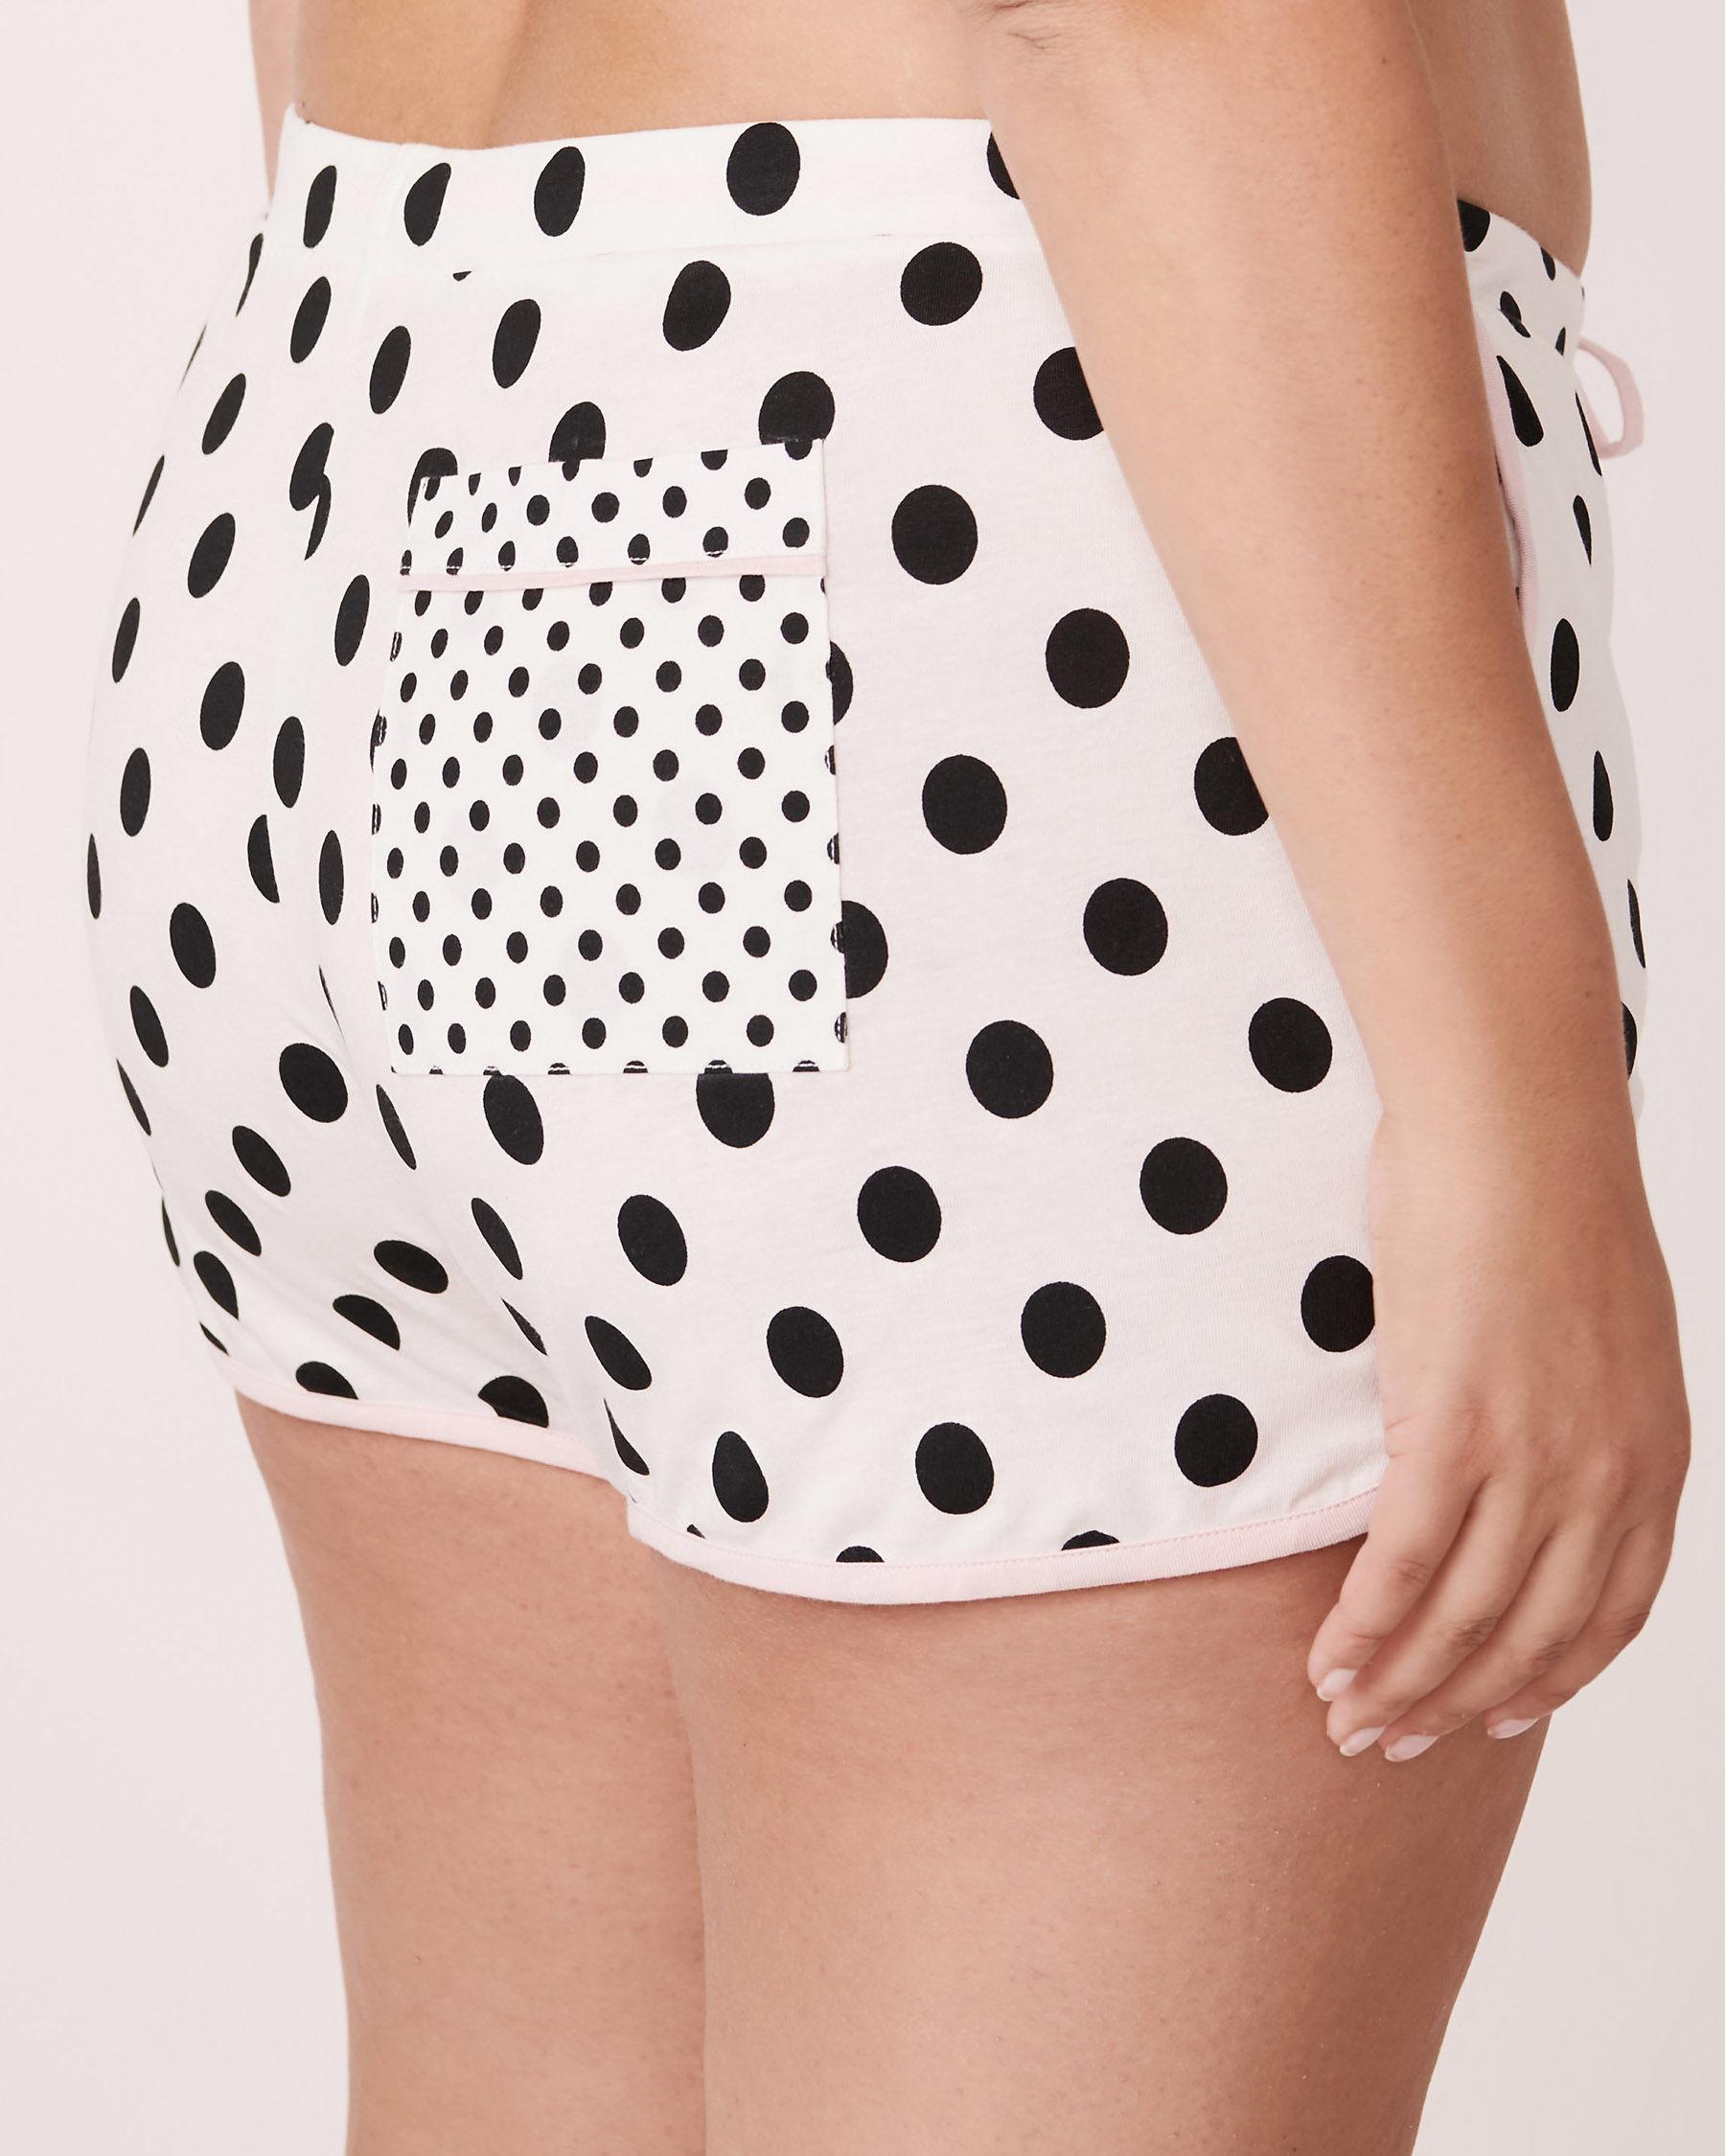 LA VIE EN ROSE Pockets Short Polka dots 770-317-0-11 - View2